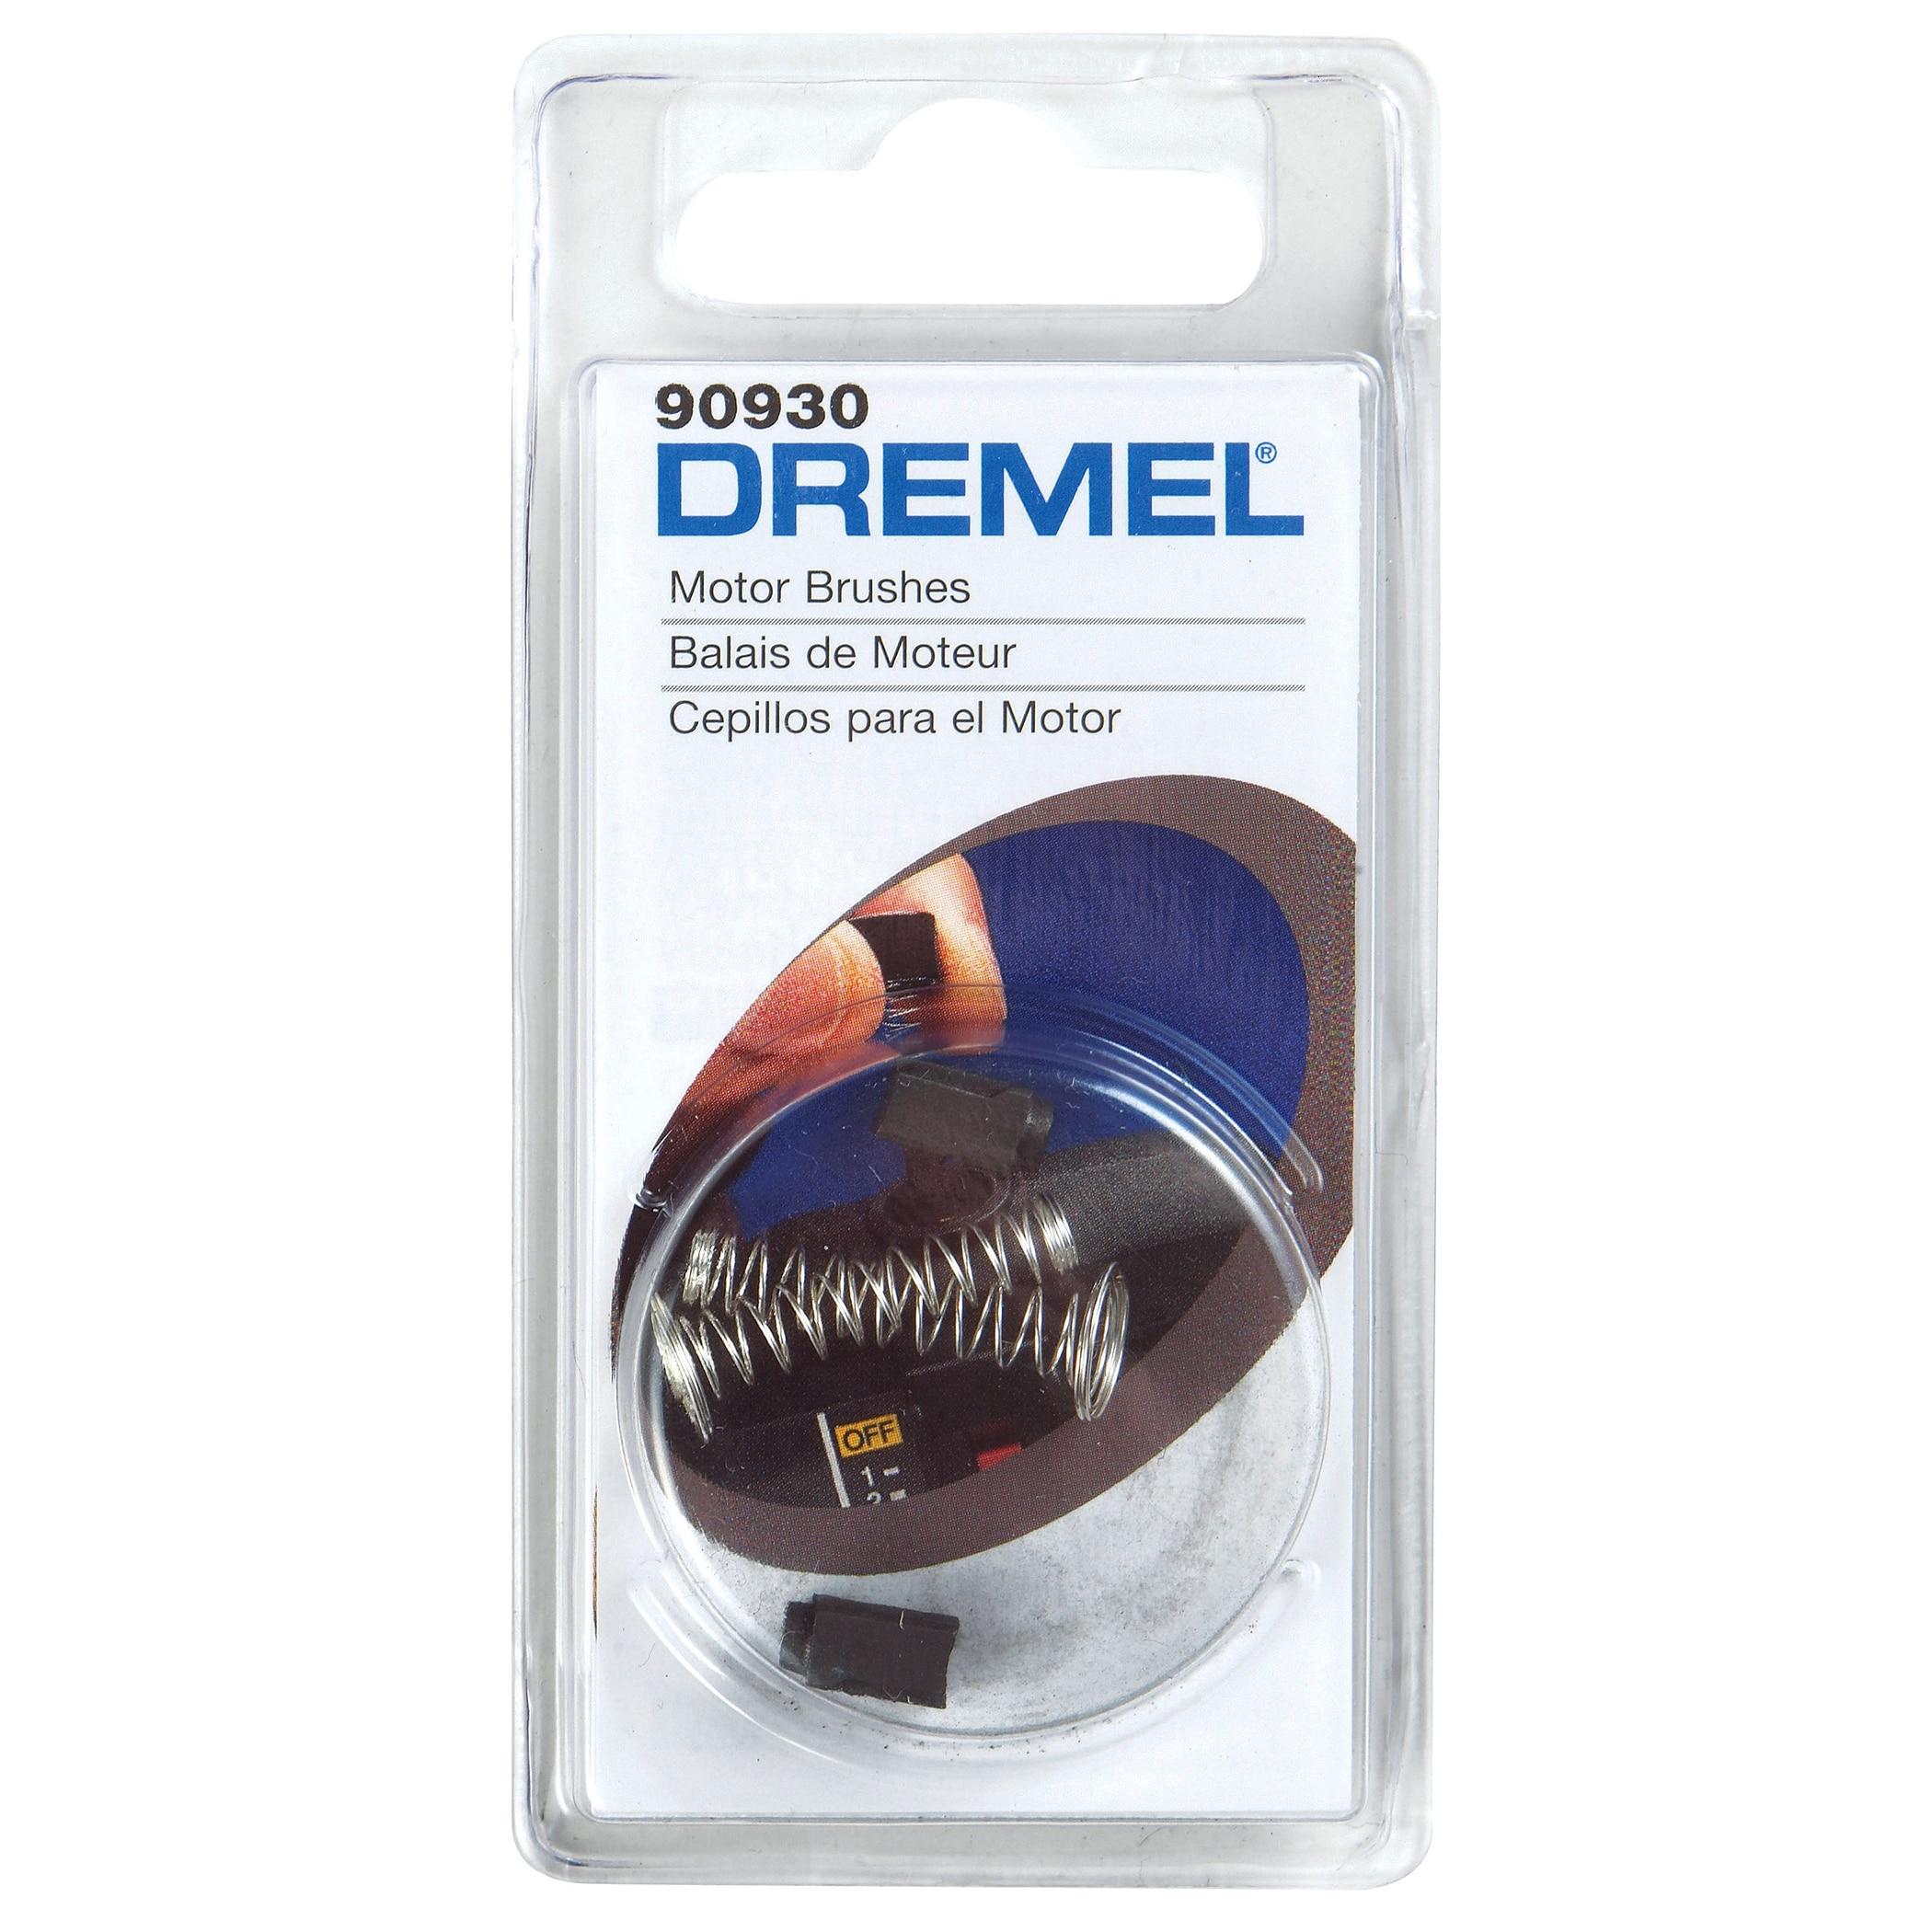 Dremel 90930-05 Carbon Motor Brush (Rotary tools), White